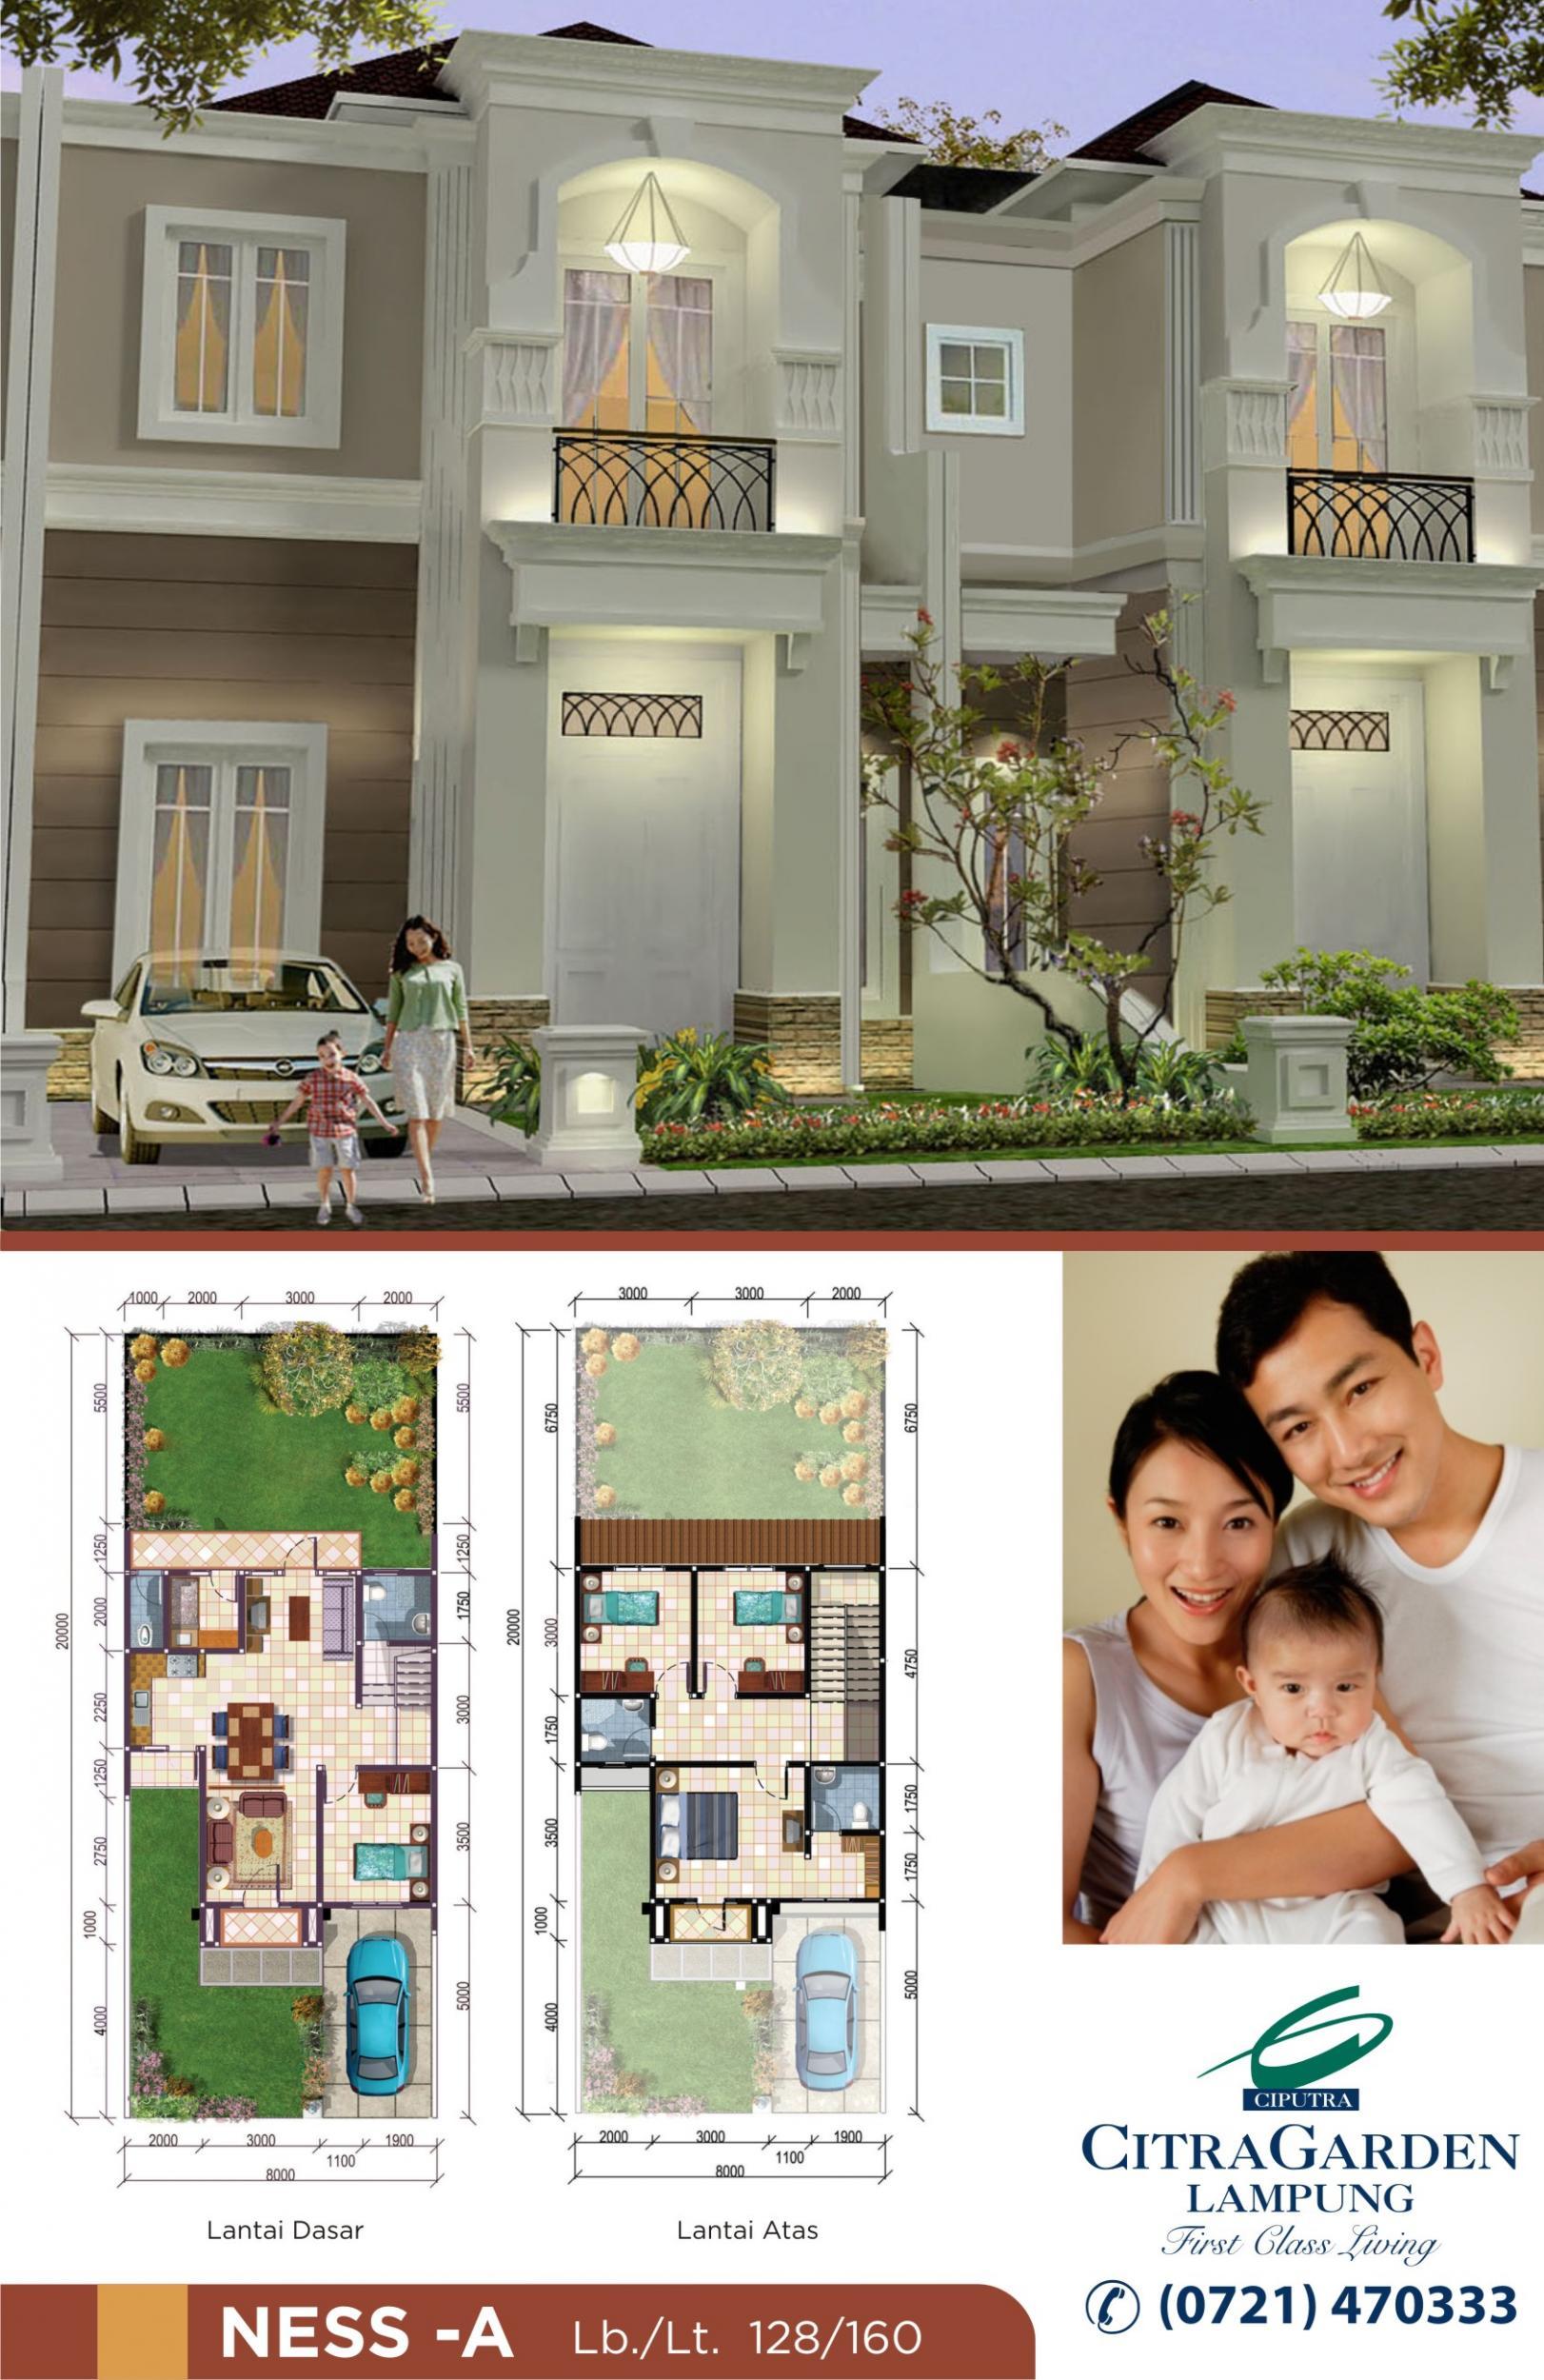 Rumah Dijual 085378098107 Hunian Mewah Citra Garden Lampung Taman Air